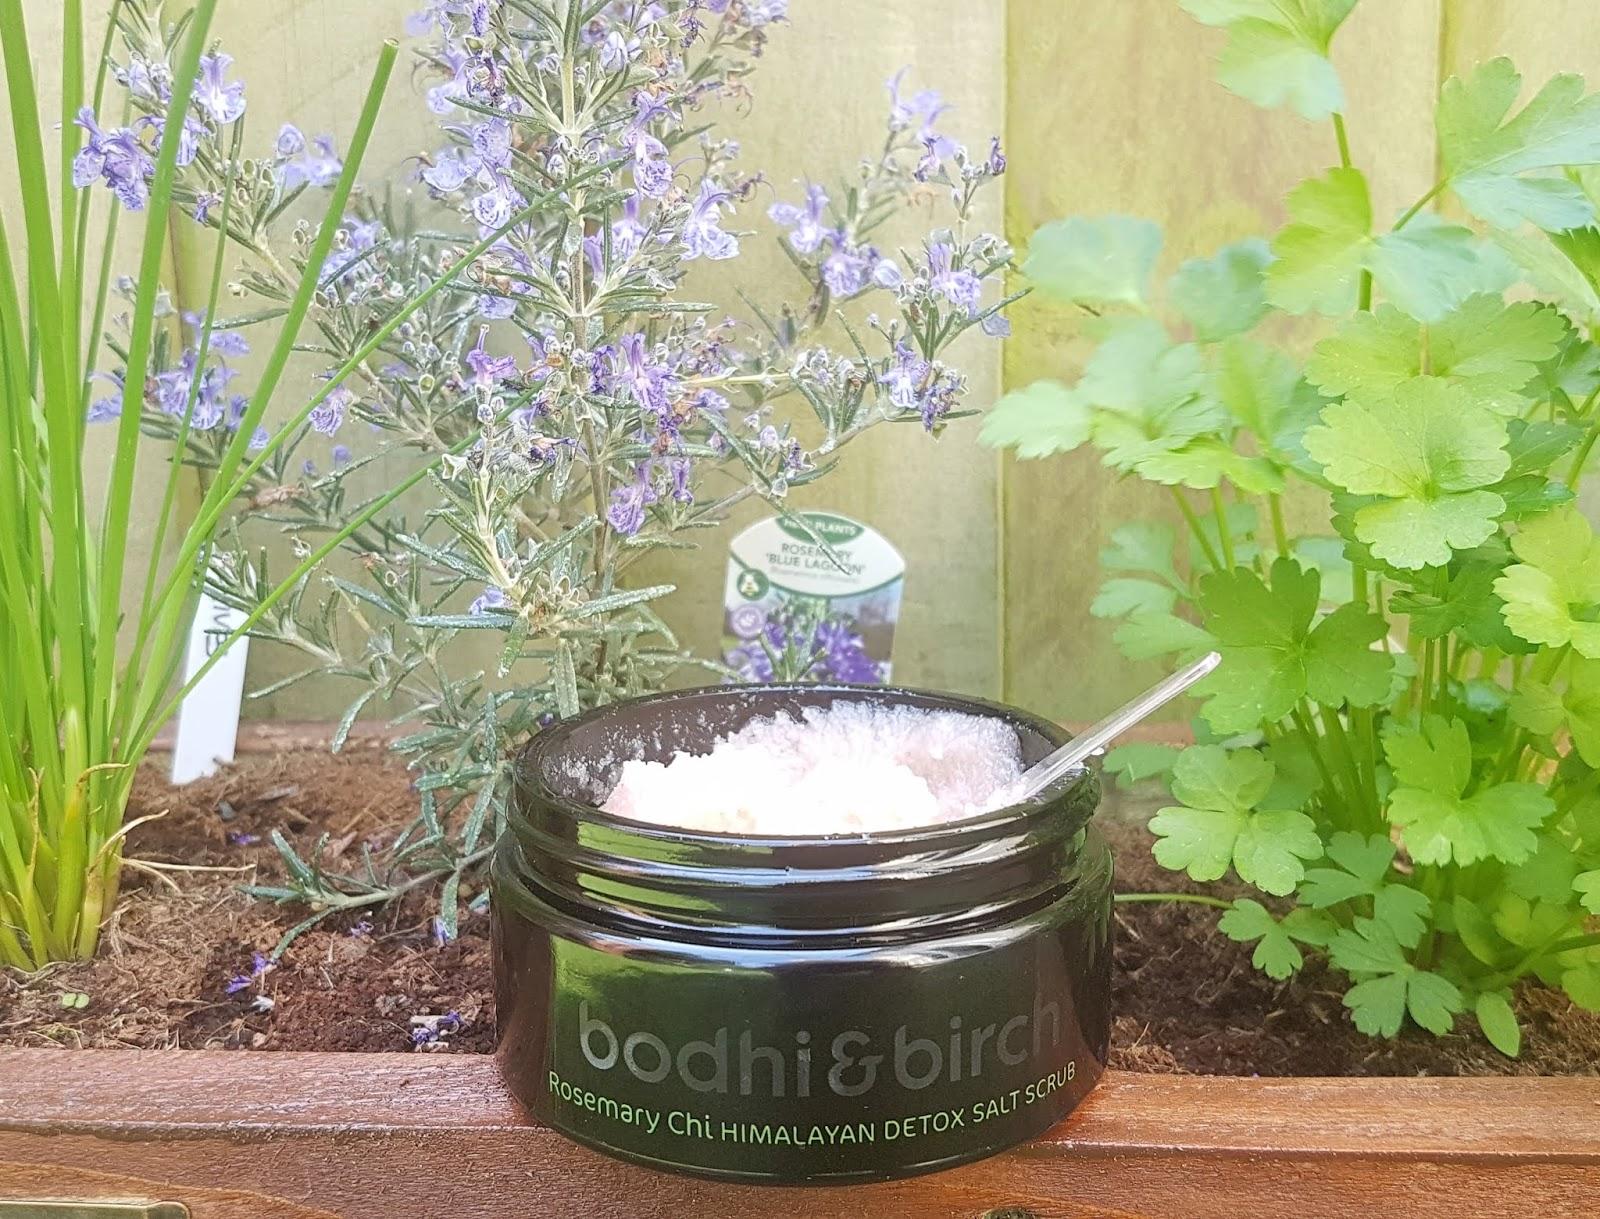 Bodhi & Birch Rosemary Chi Himalayan Detox Salt Scrub Review